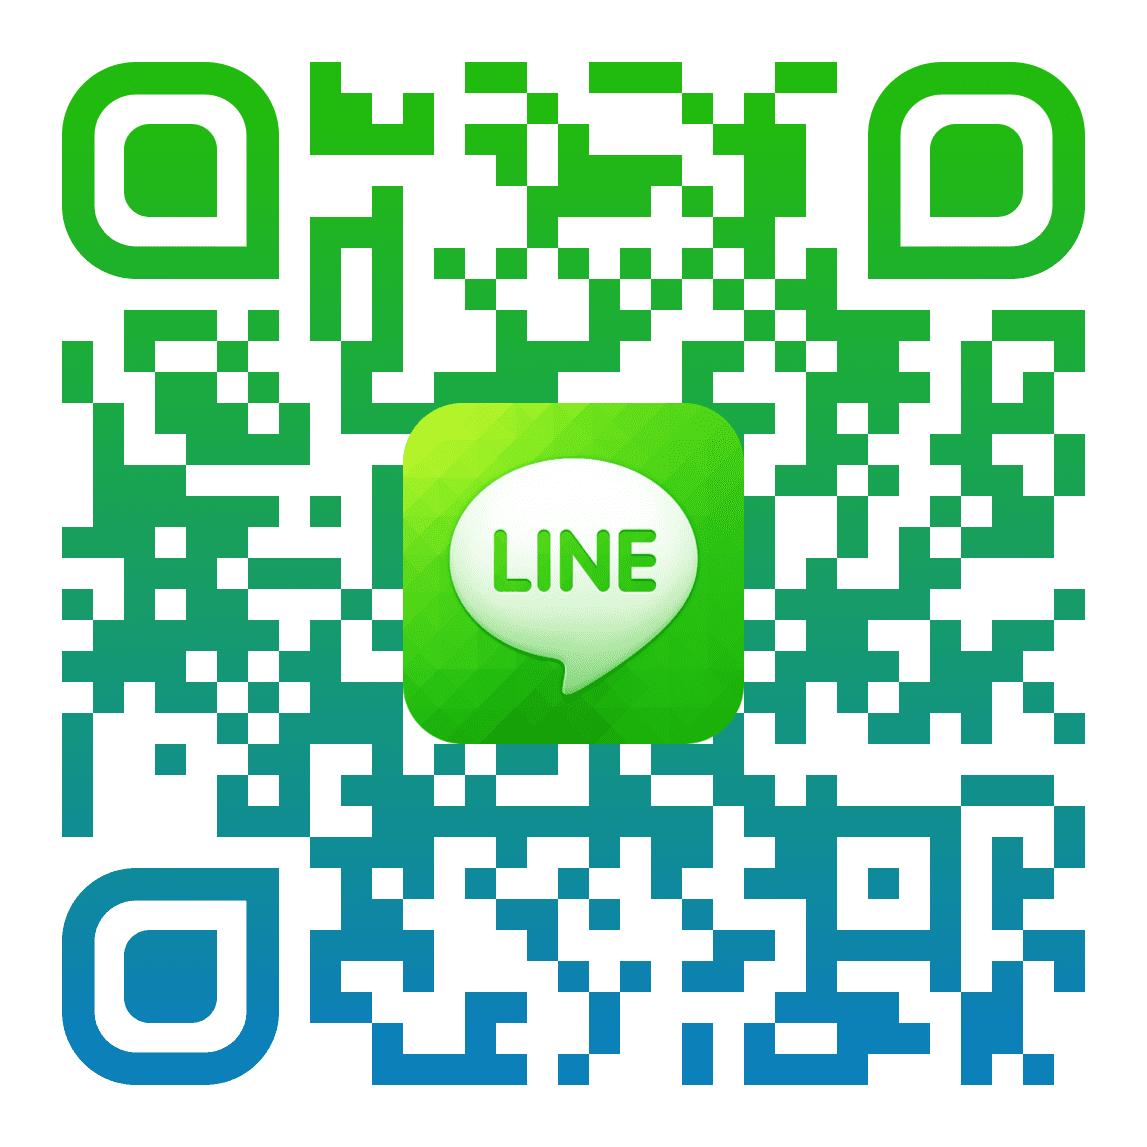 Add Line Friend